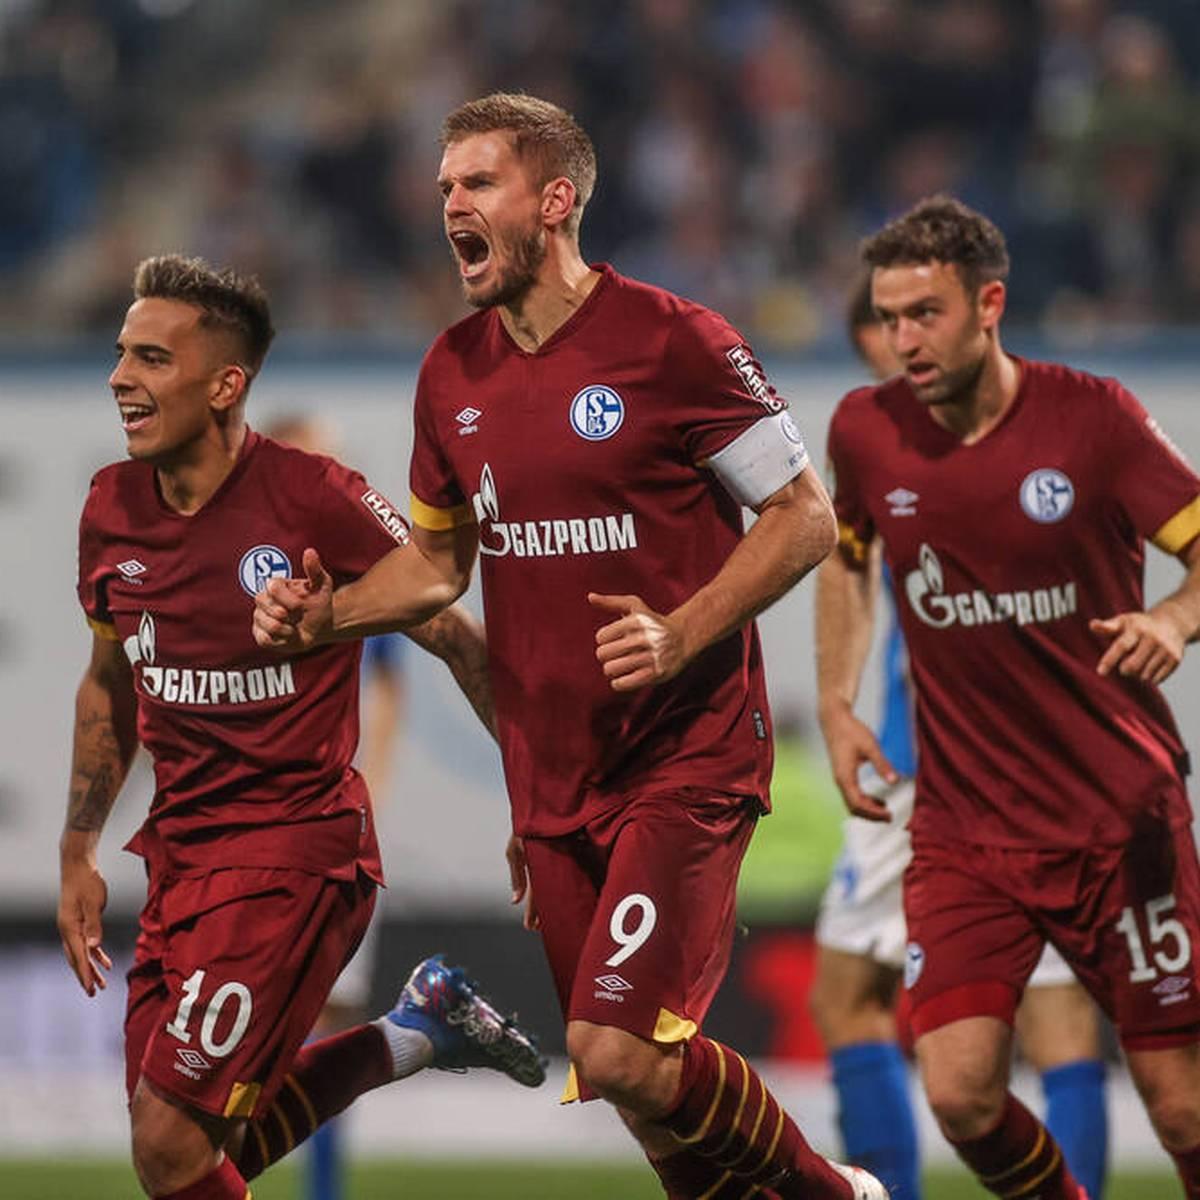 Terodde-Doppelpack! Schalke jubelt in Rostock